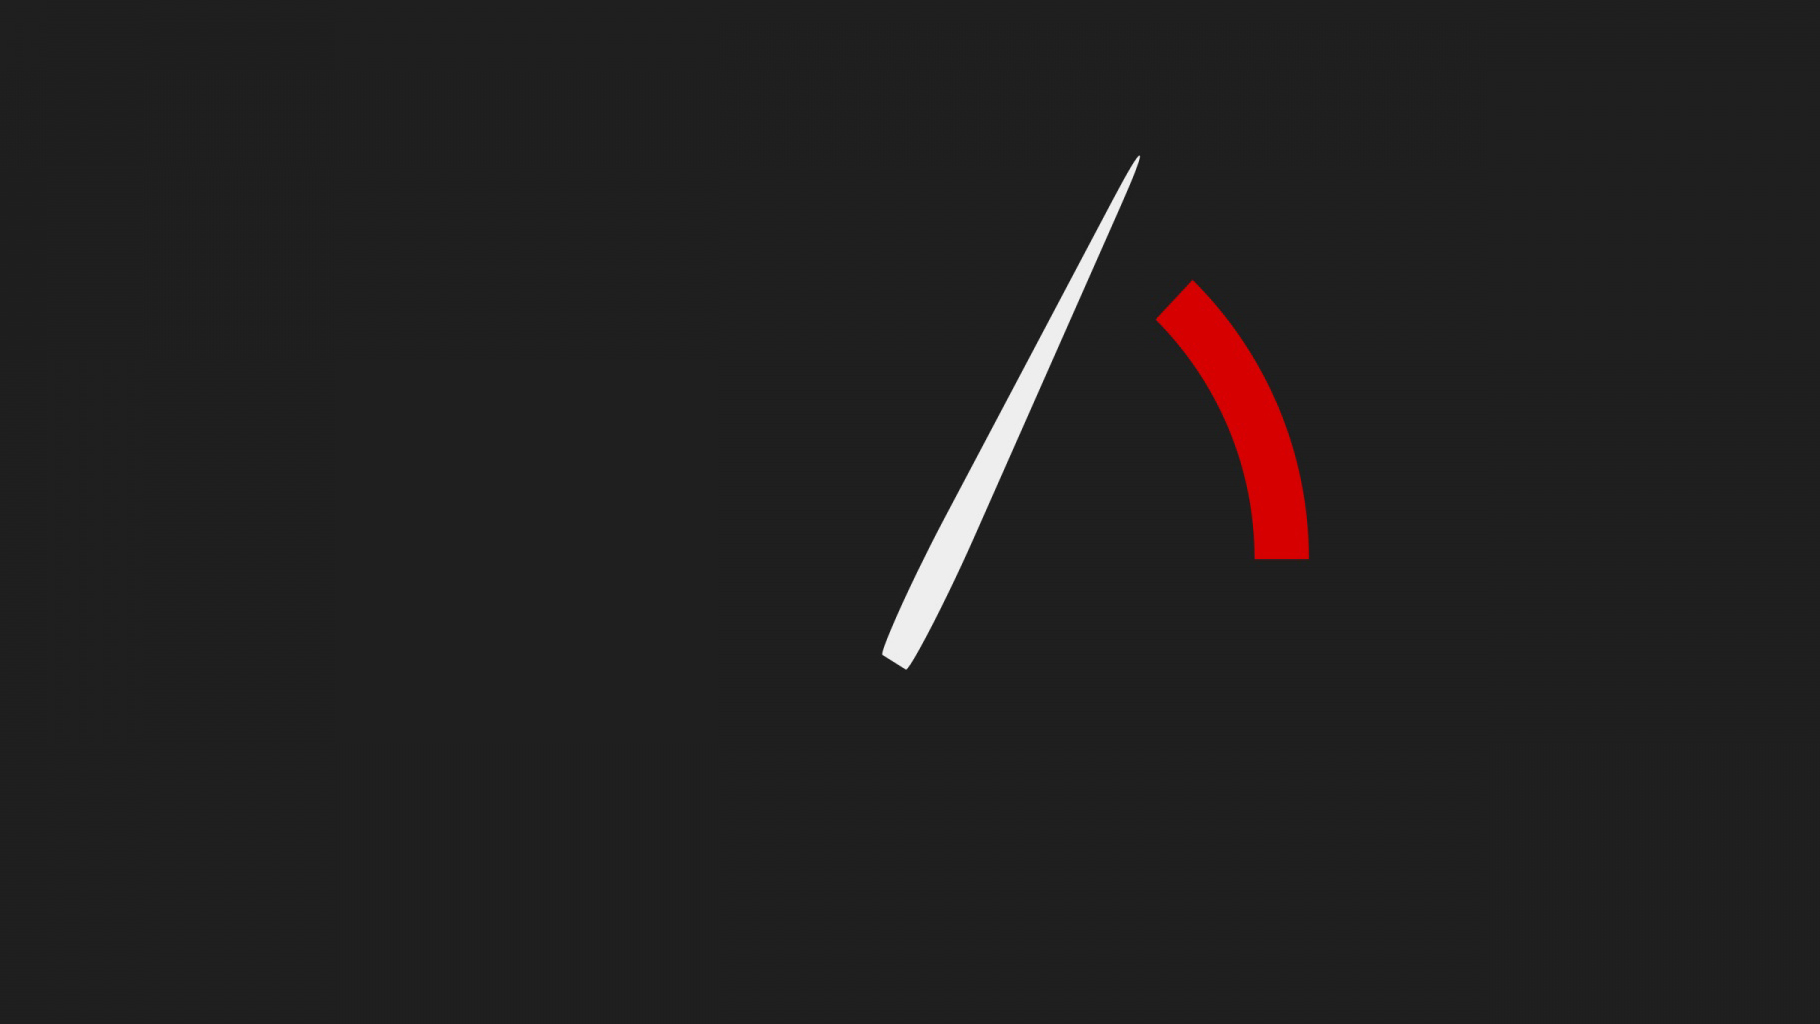 Speedometer Google Cover